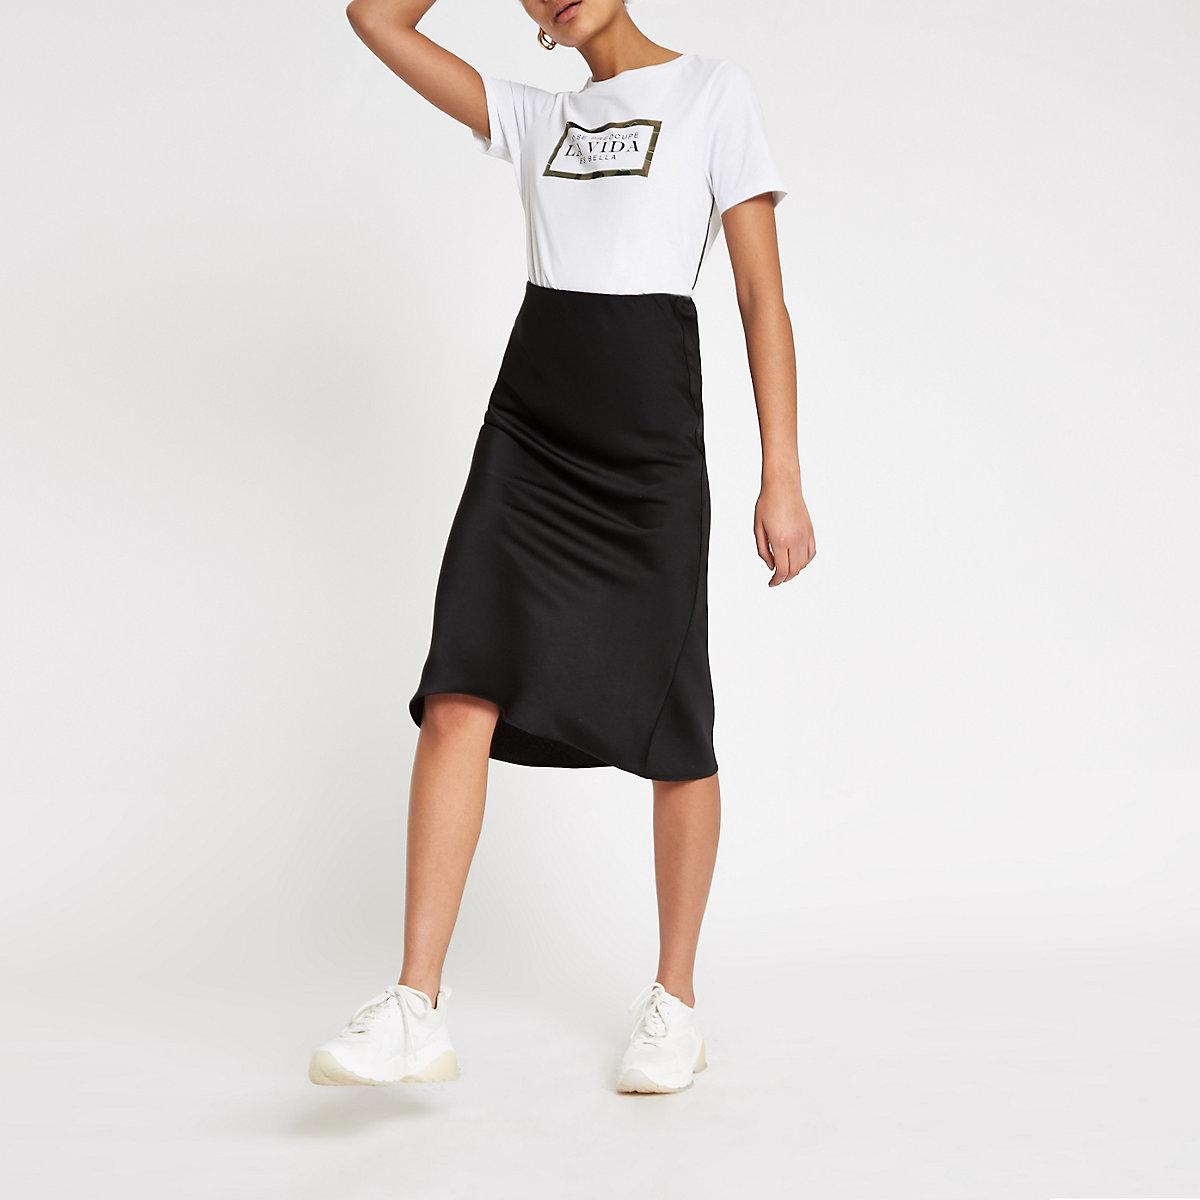 White 'La vida' camo print T-shirt